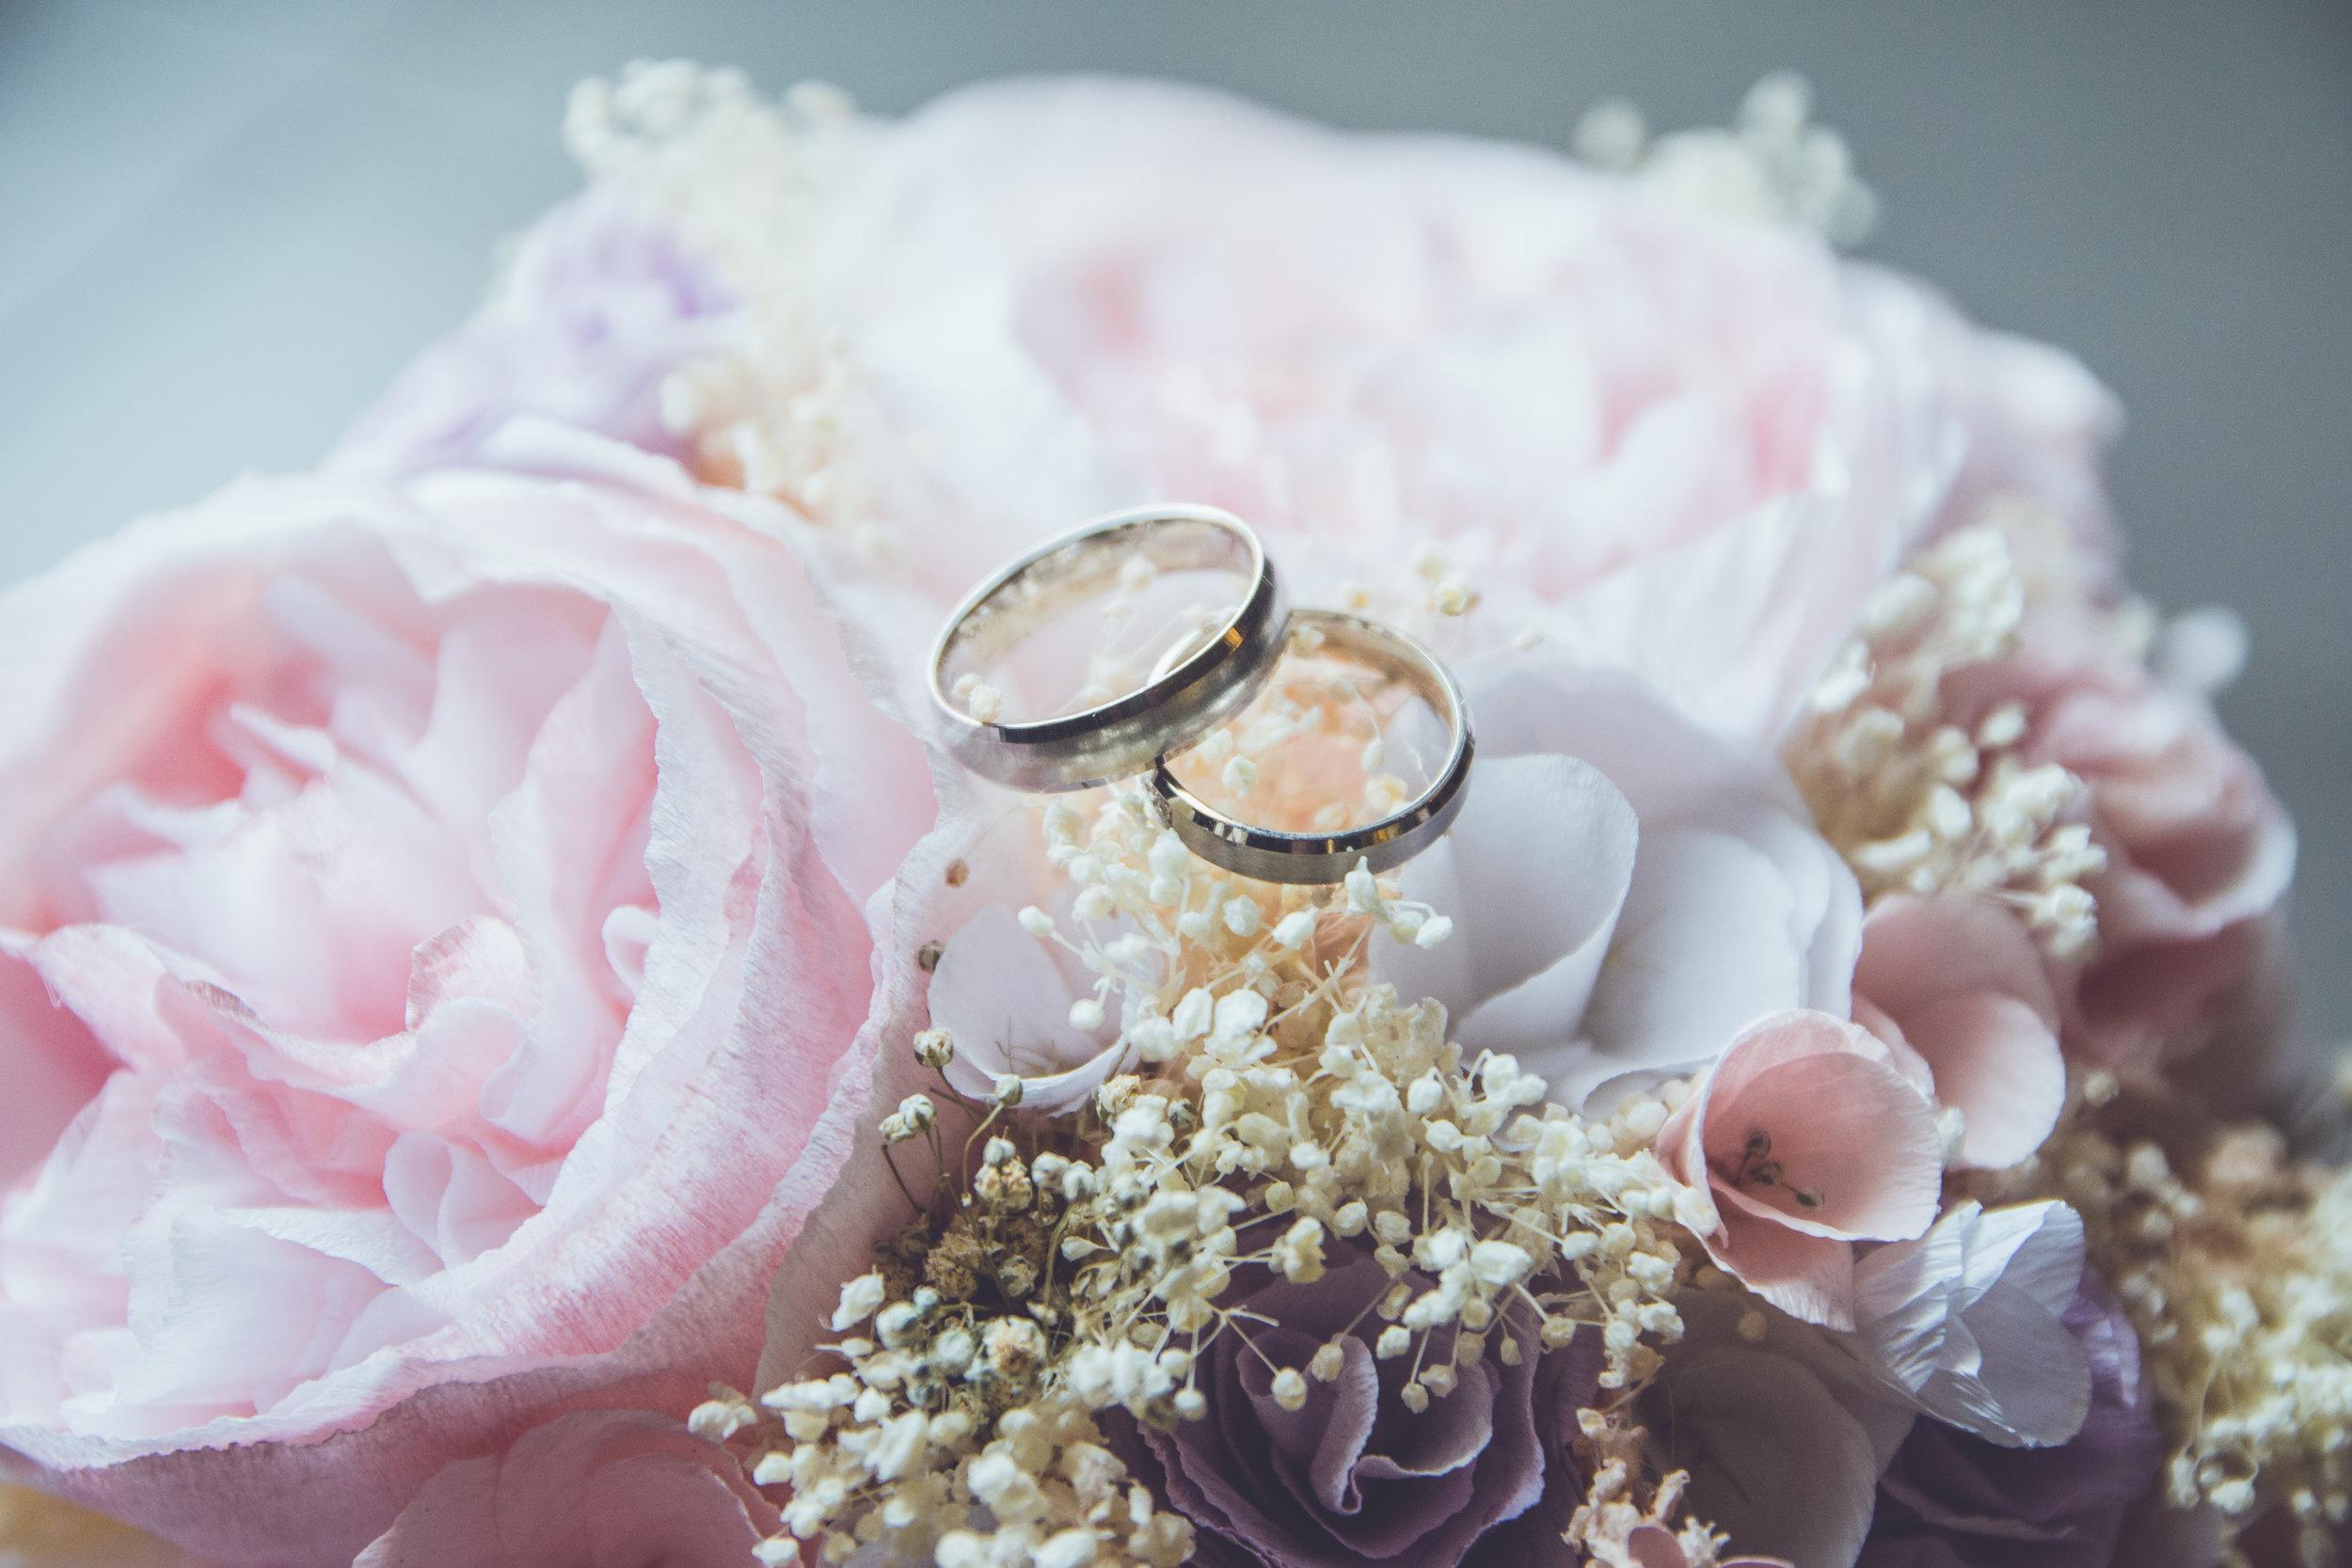 Rays of Love - © 2016Genre: Soft RockTheme: Wedding/Proposal